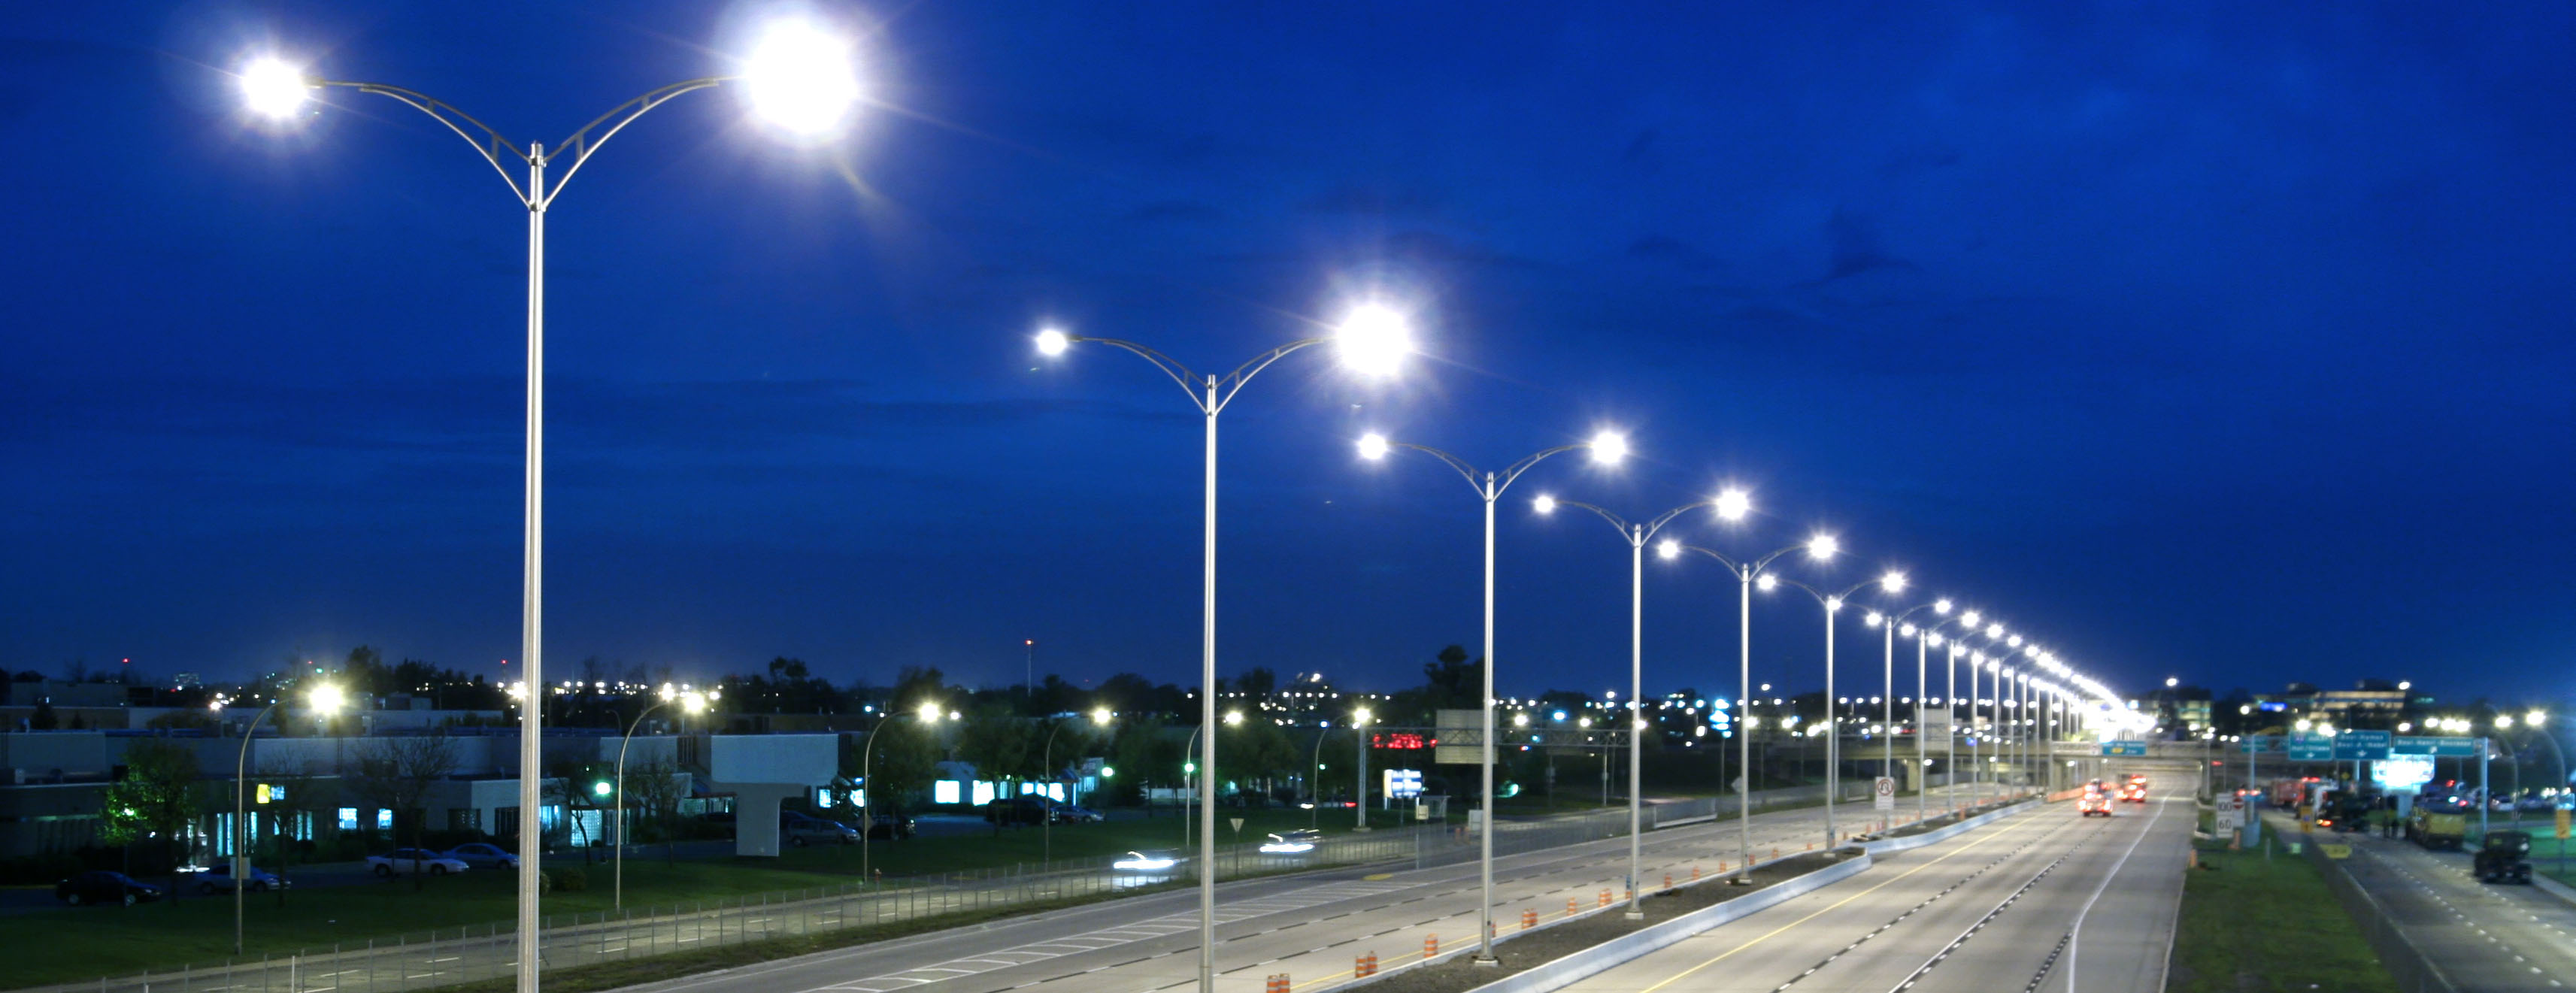 Colorado Springs installs LED streetlights | Lumenistics